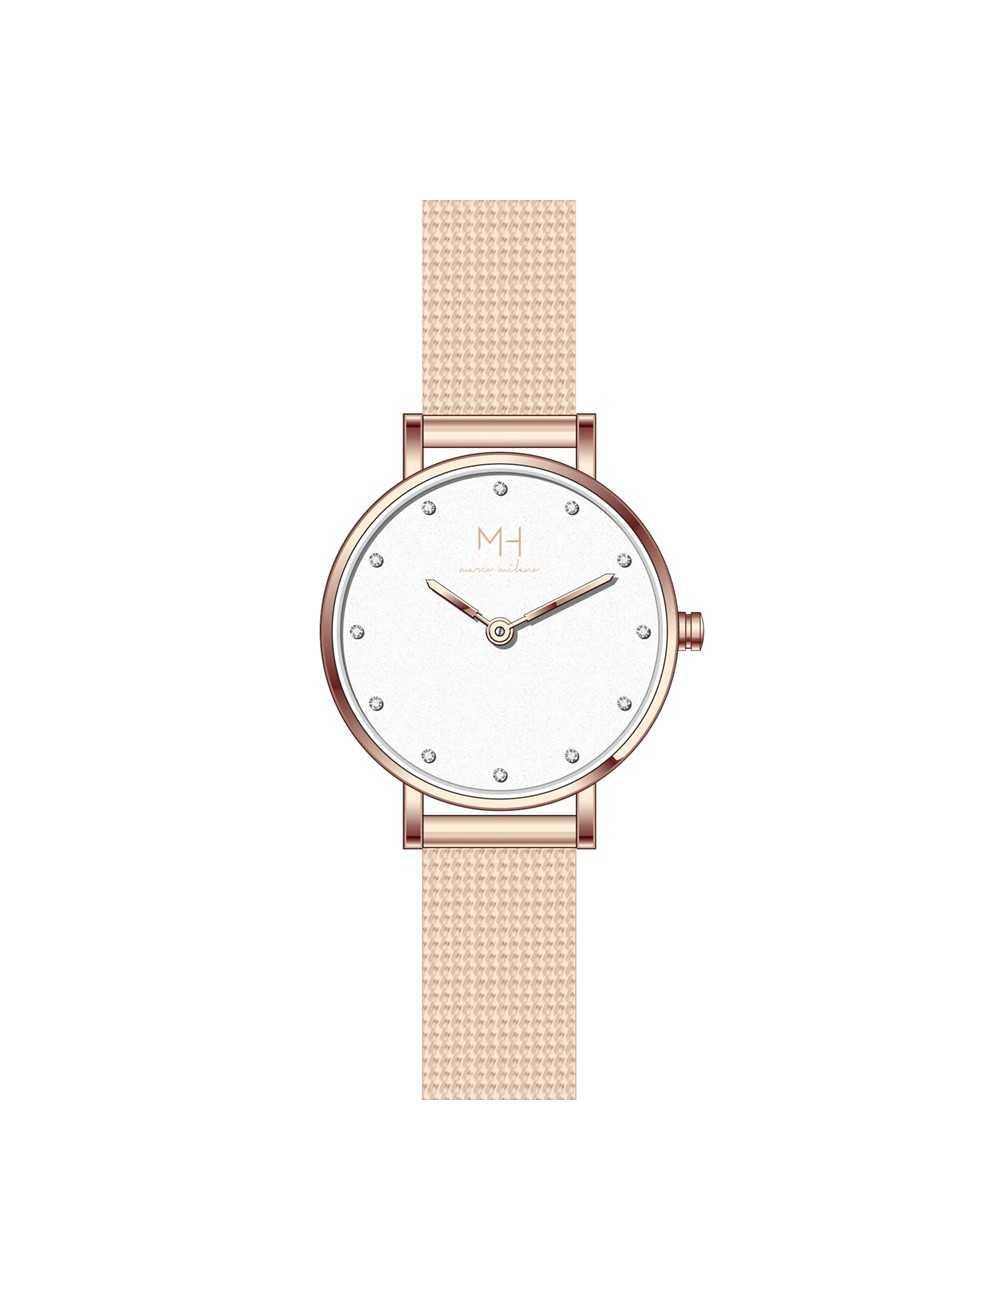 Dámske hodinky Marco Milano MH99214SL1